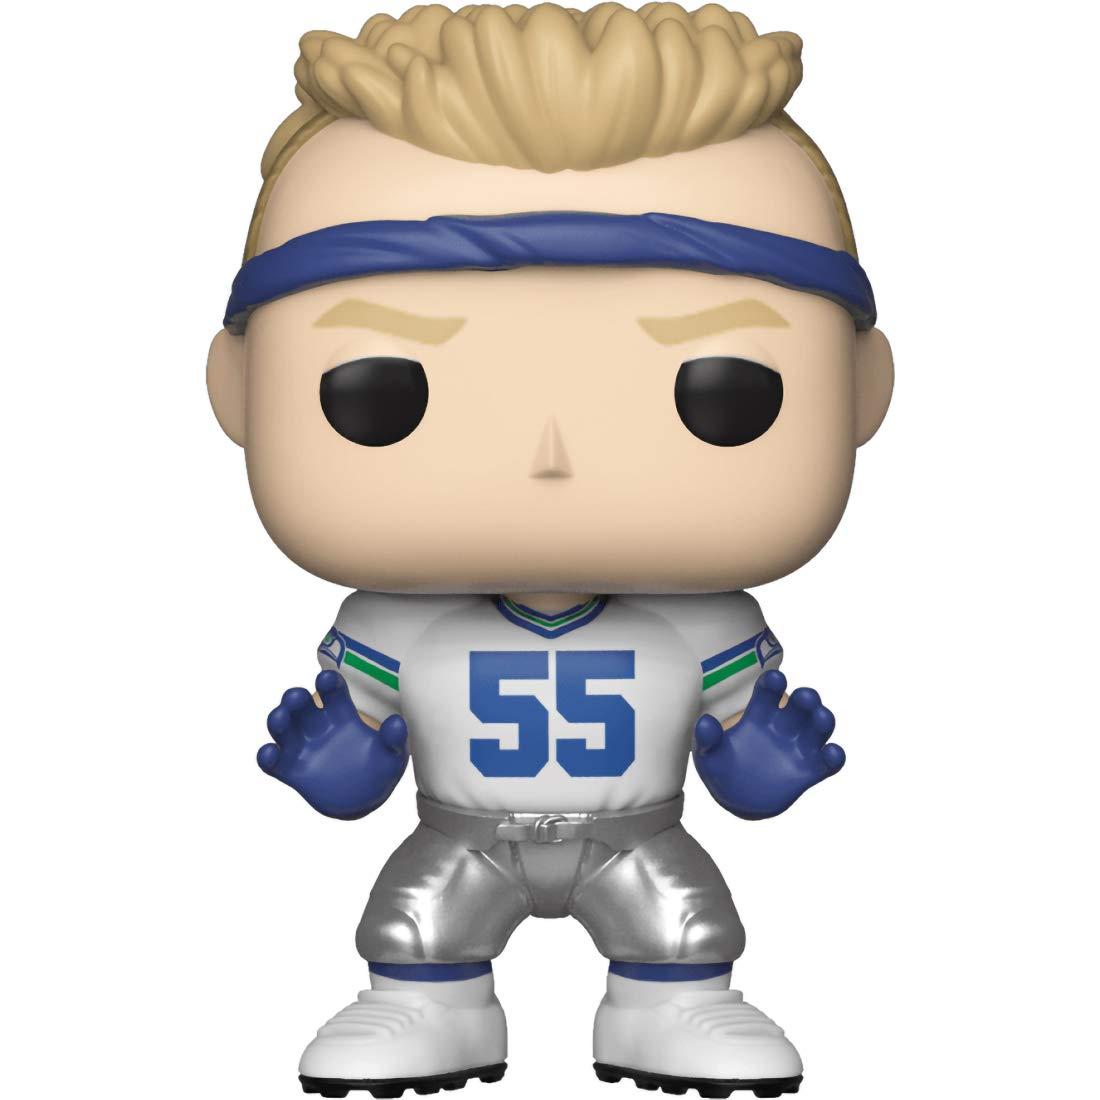 Football Vinyl Figure /& 1 PET Plastic Graphical Protector Bundle Brian Bosworth : NFL x Funko POP BCC94Z180 Seattle Seahawks #113 // 33306 - B